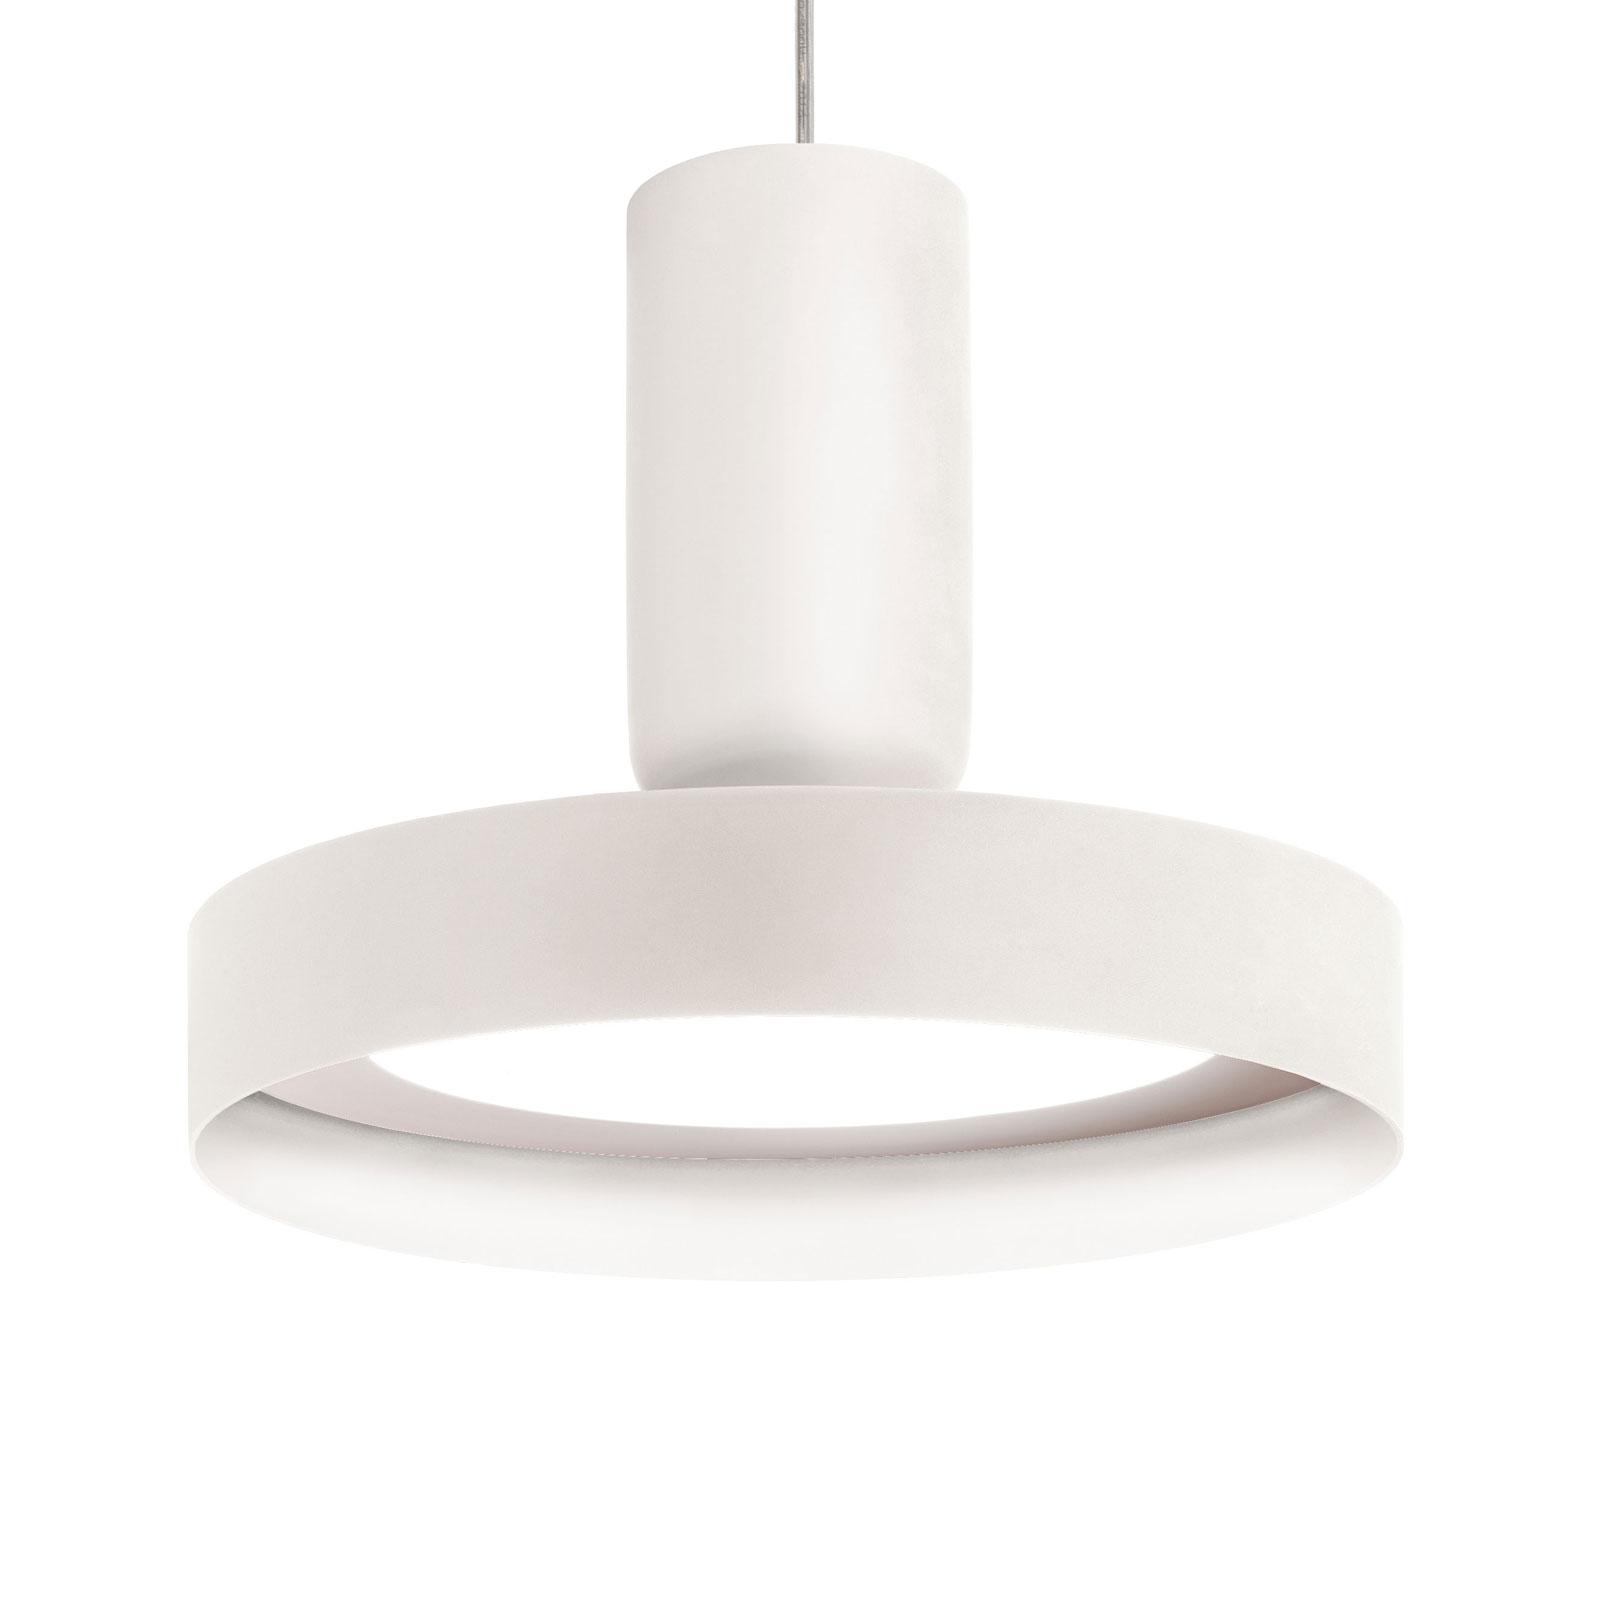 Modo Luce Hammer lampa wisząca Ø 18 cm biała